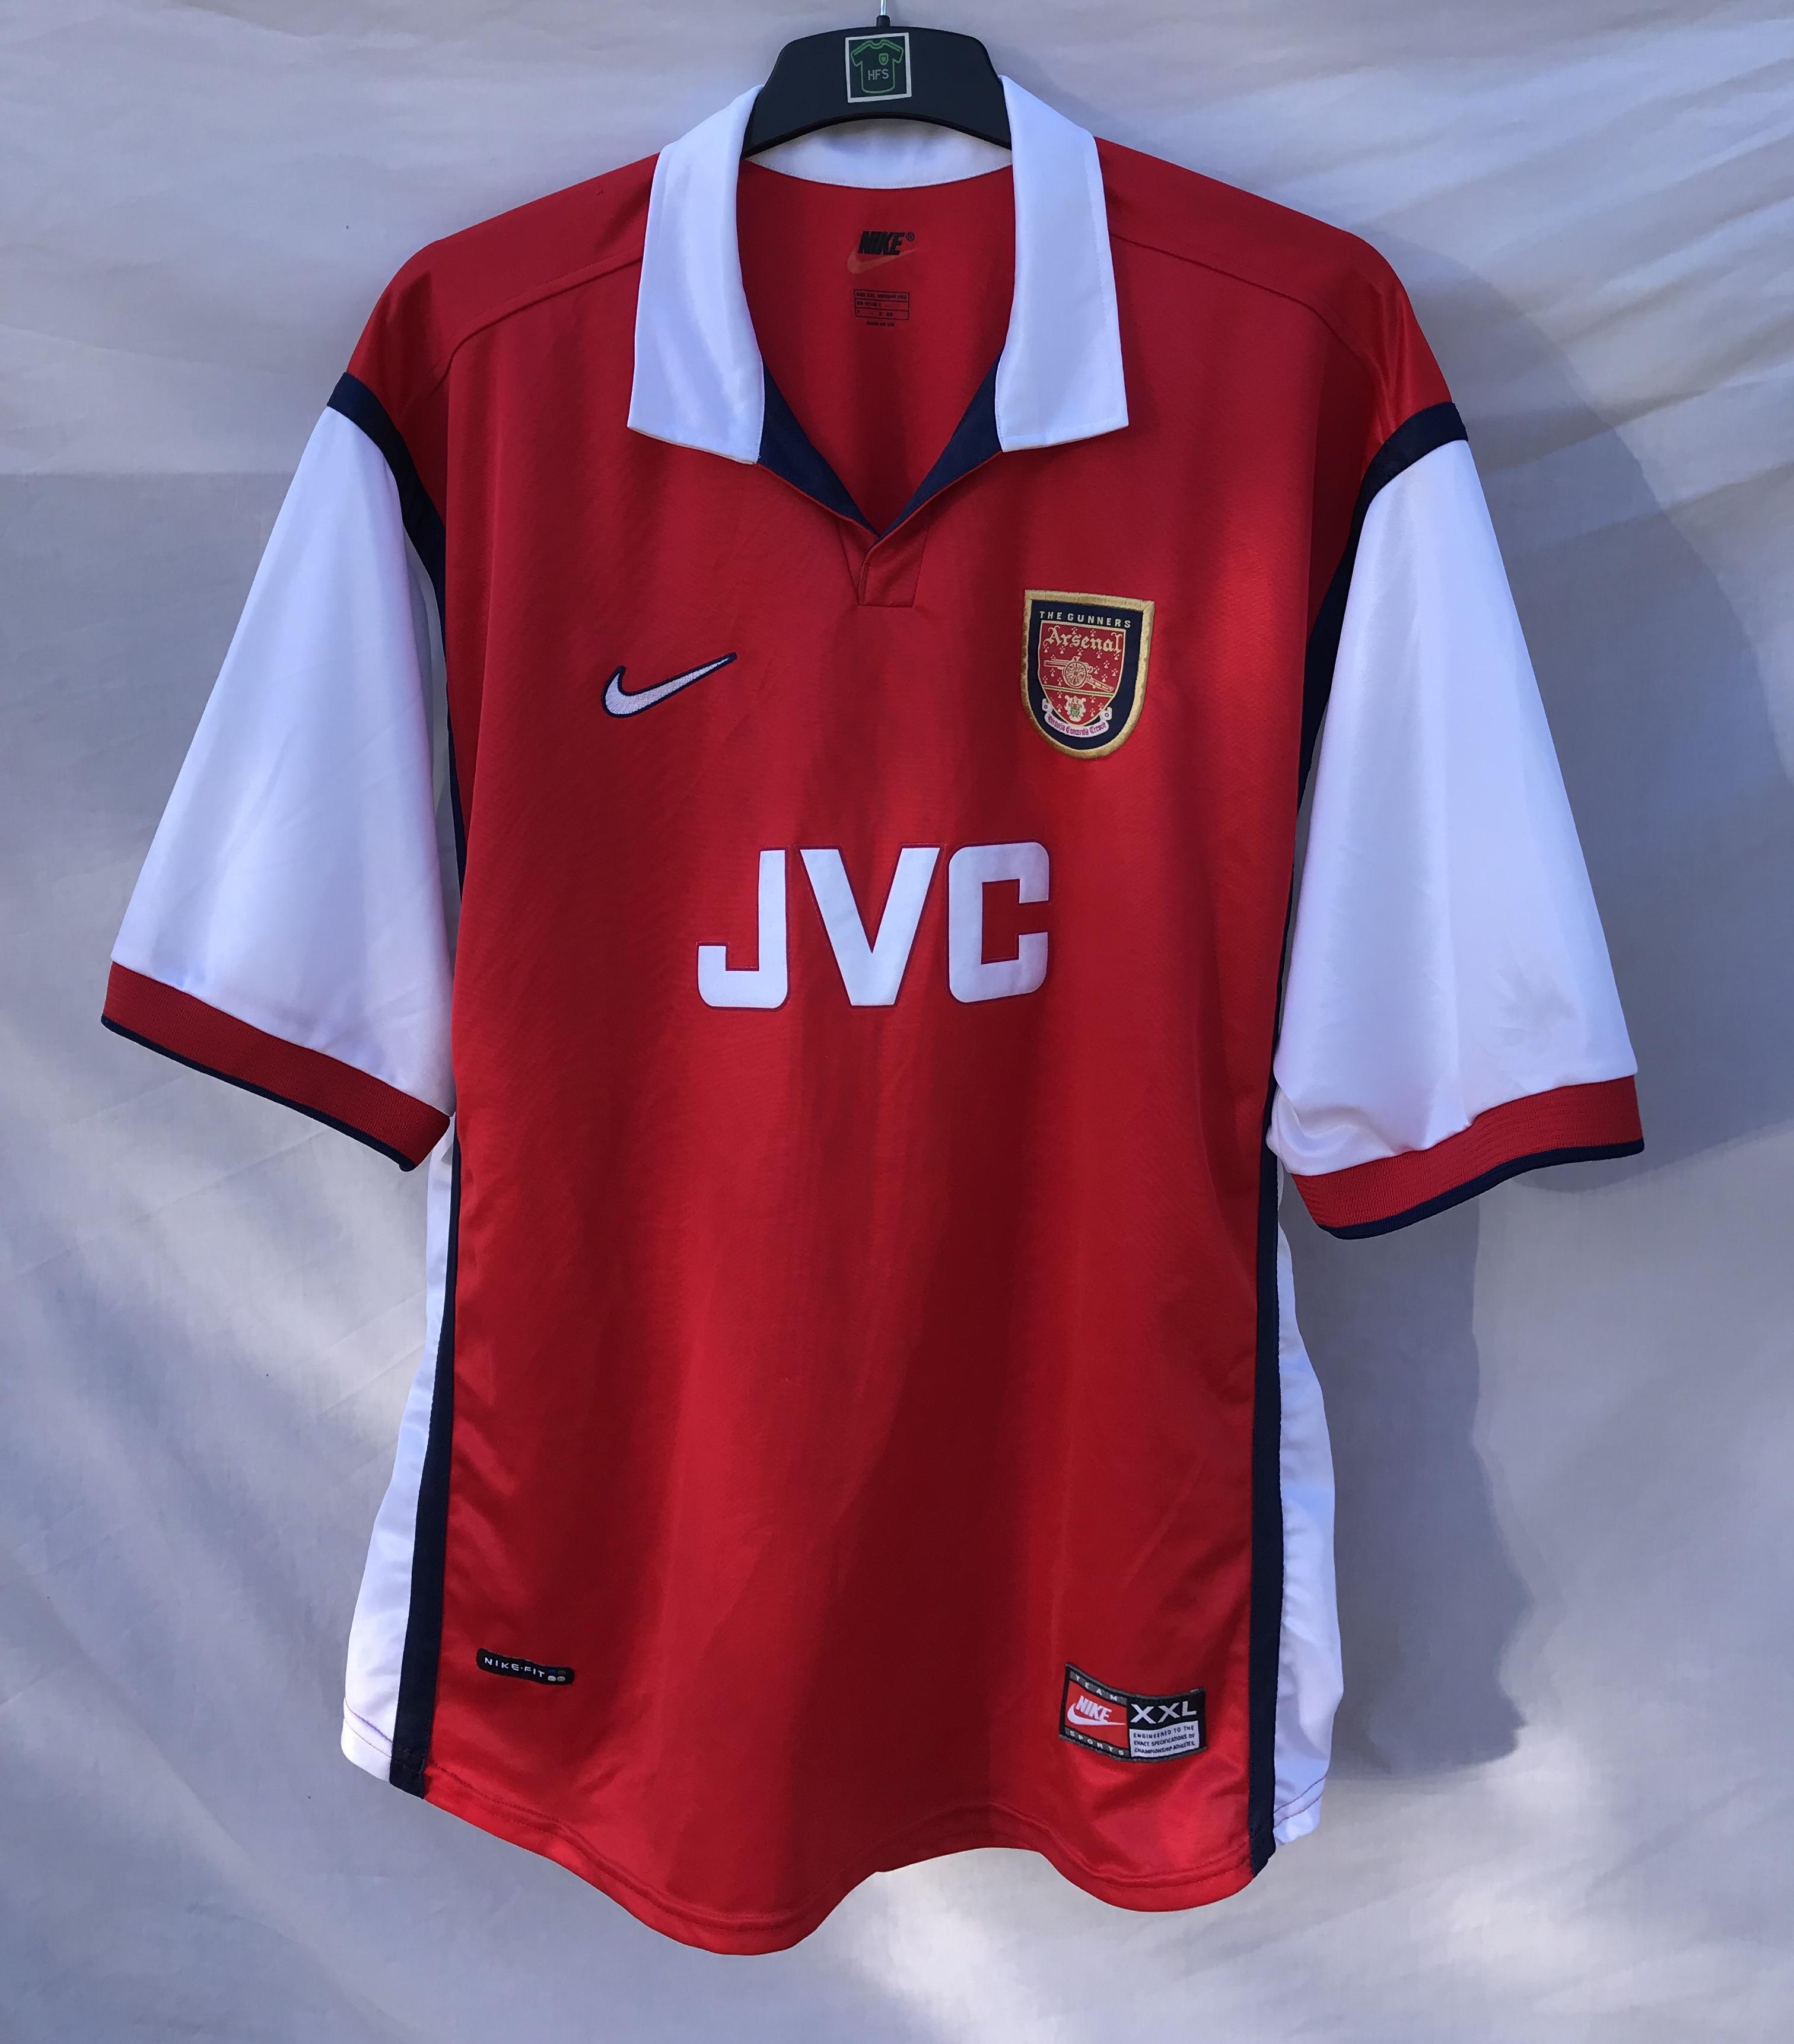 ffeb15e28d317 Arsenal Football Shirt 1998 99 Adults XXL Nike – Historic Football ...